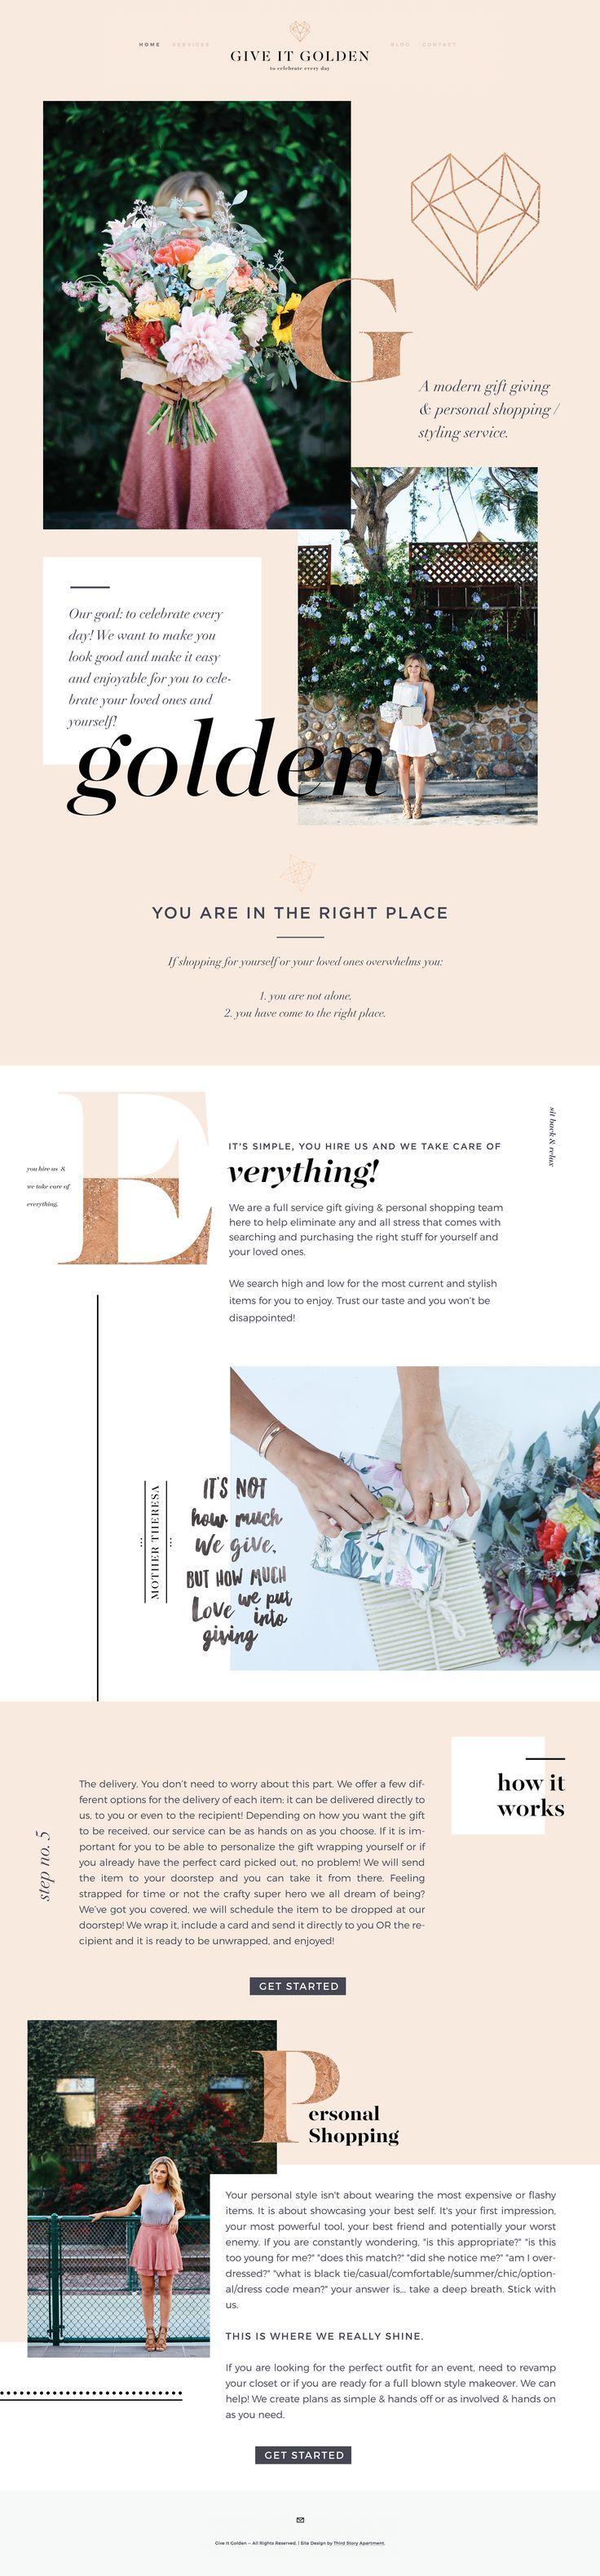 Web Design by Third Story Apartment, Lindsey Eryn Clark Project: #Branding, #WebDesign Client: Give It Golden #WebDesignLayOut #FemaleEntrepreneur #CreativeEntrepreneur